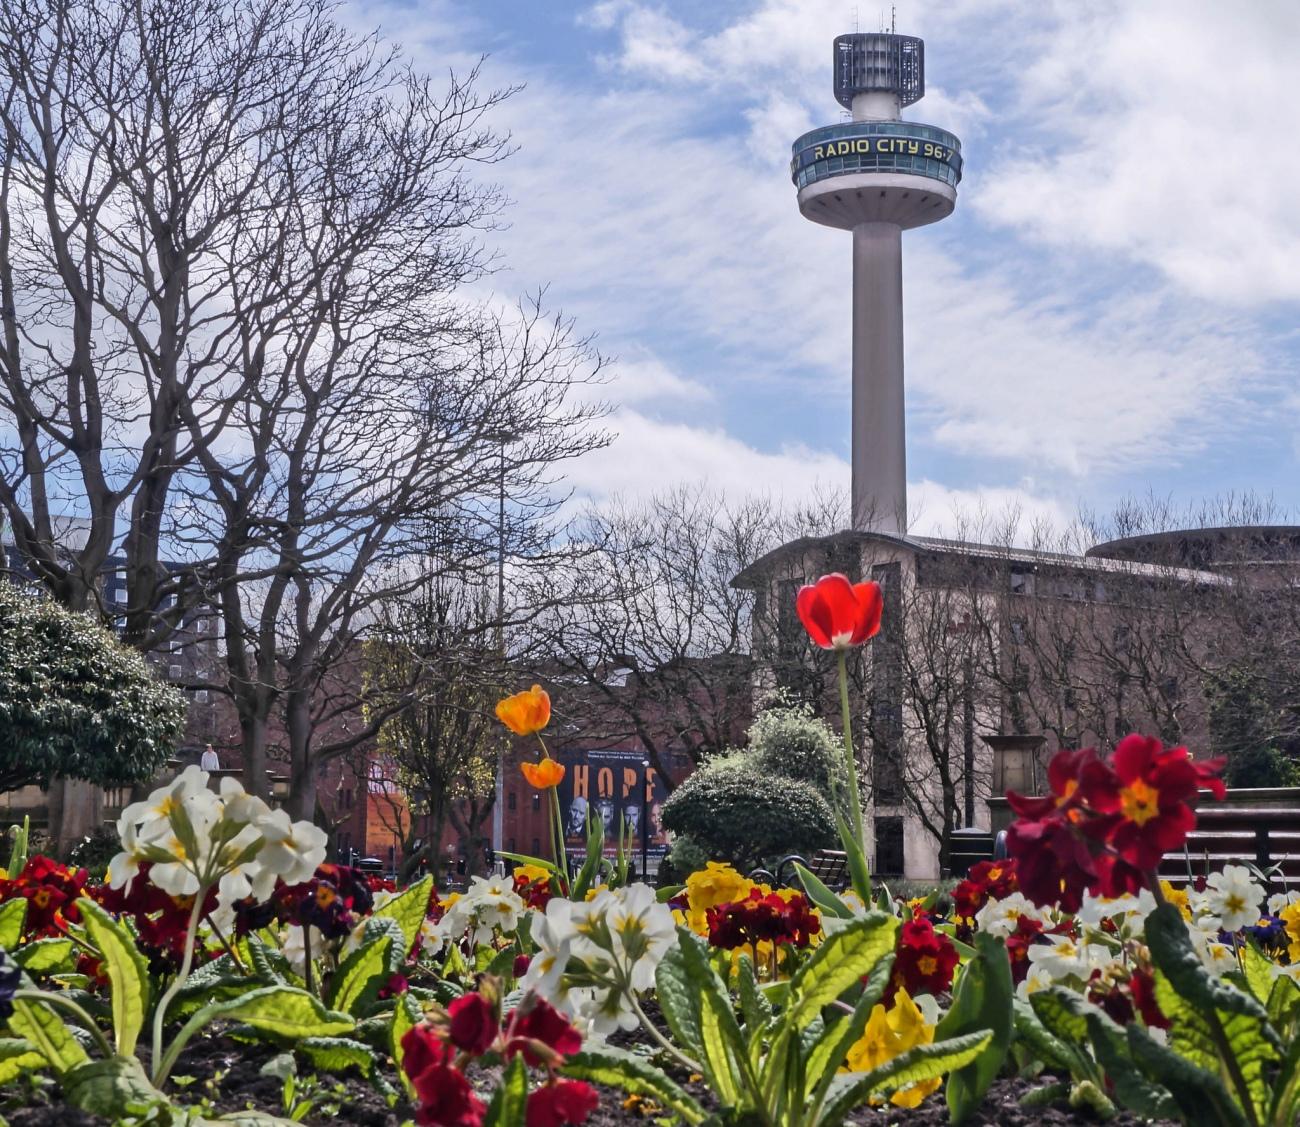 Beverley Goodwin - Radio City Tower, Liverpool